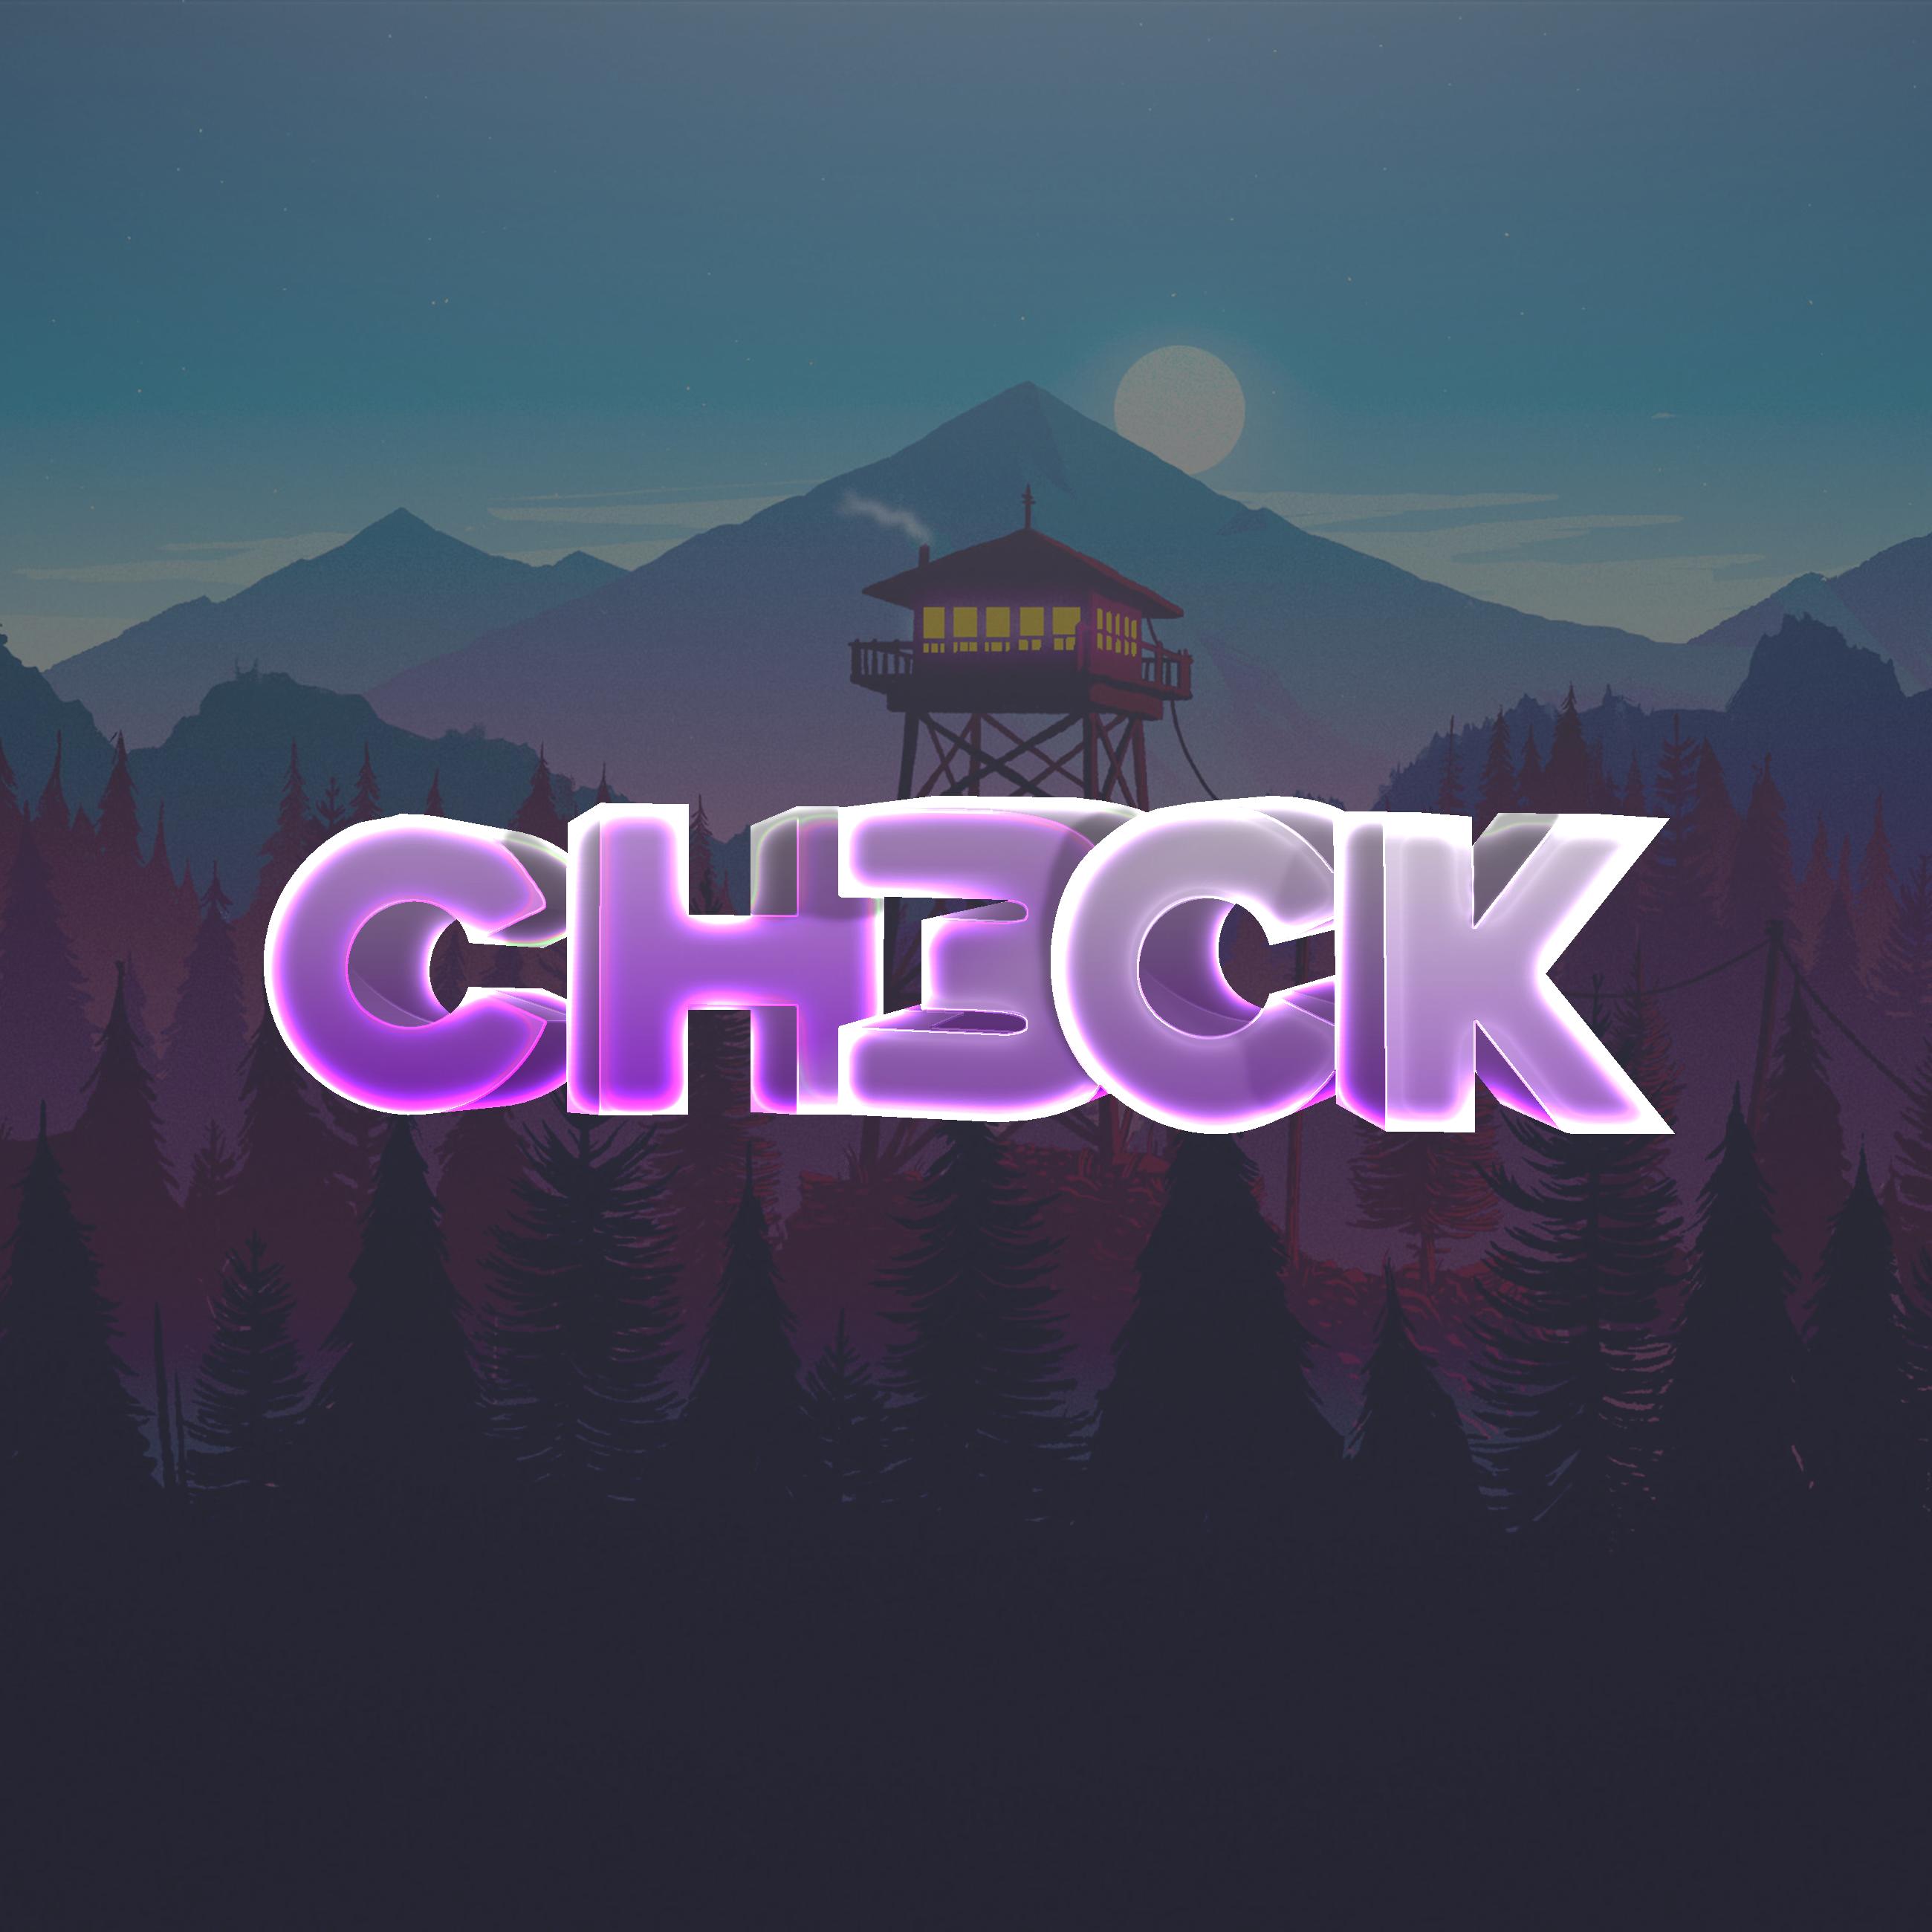 StreamElements - xch3ck